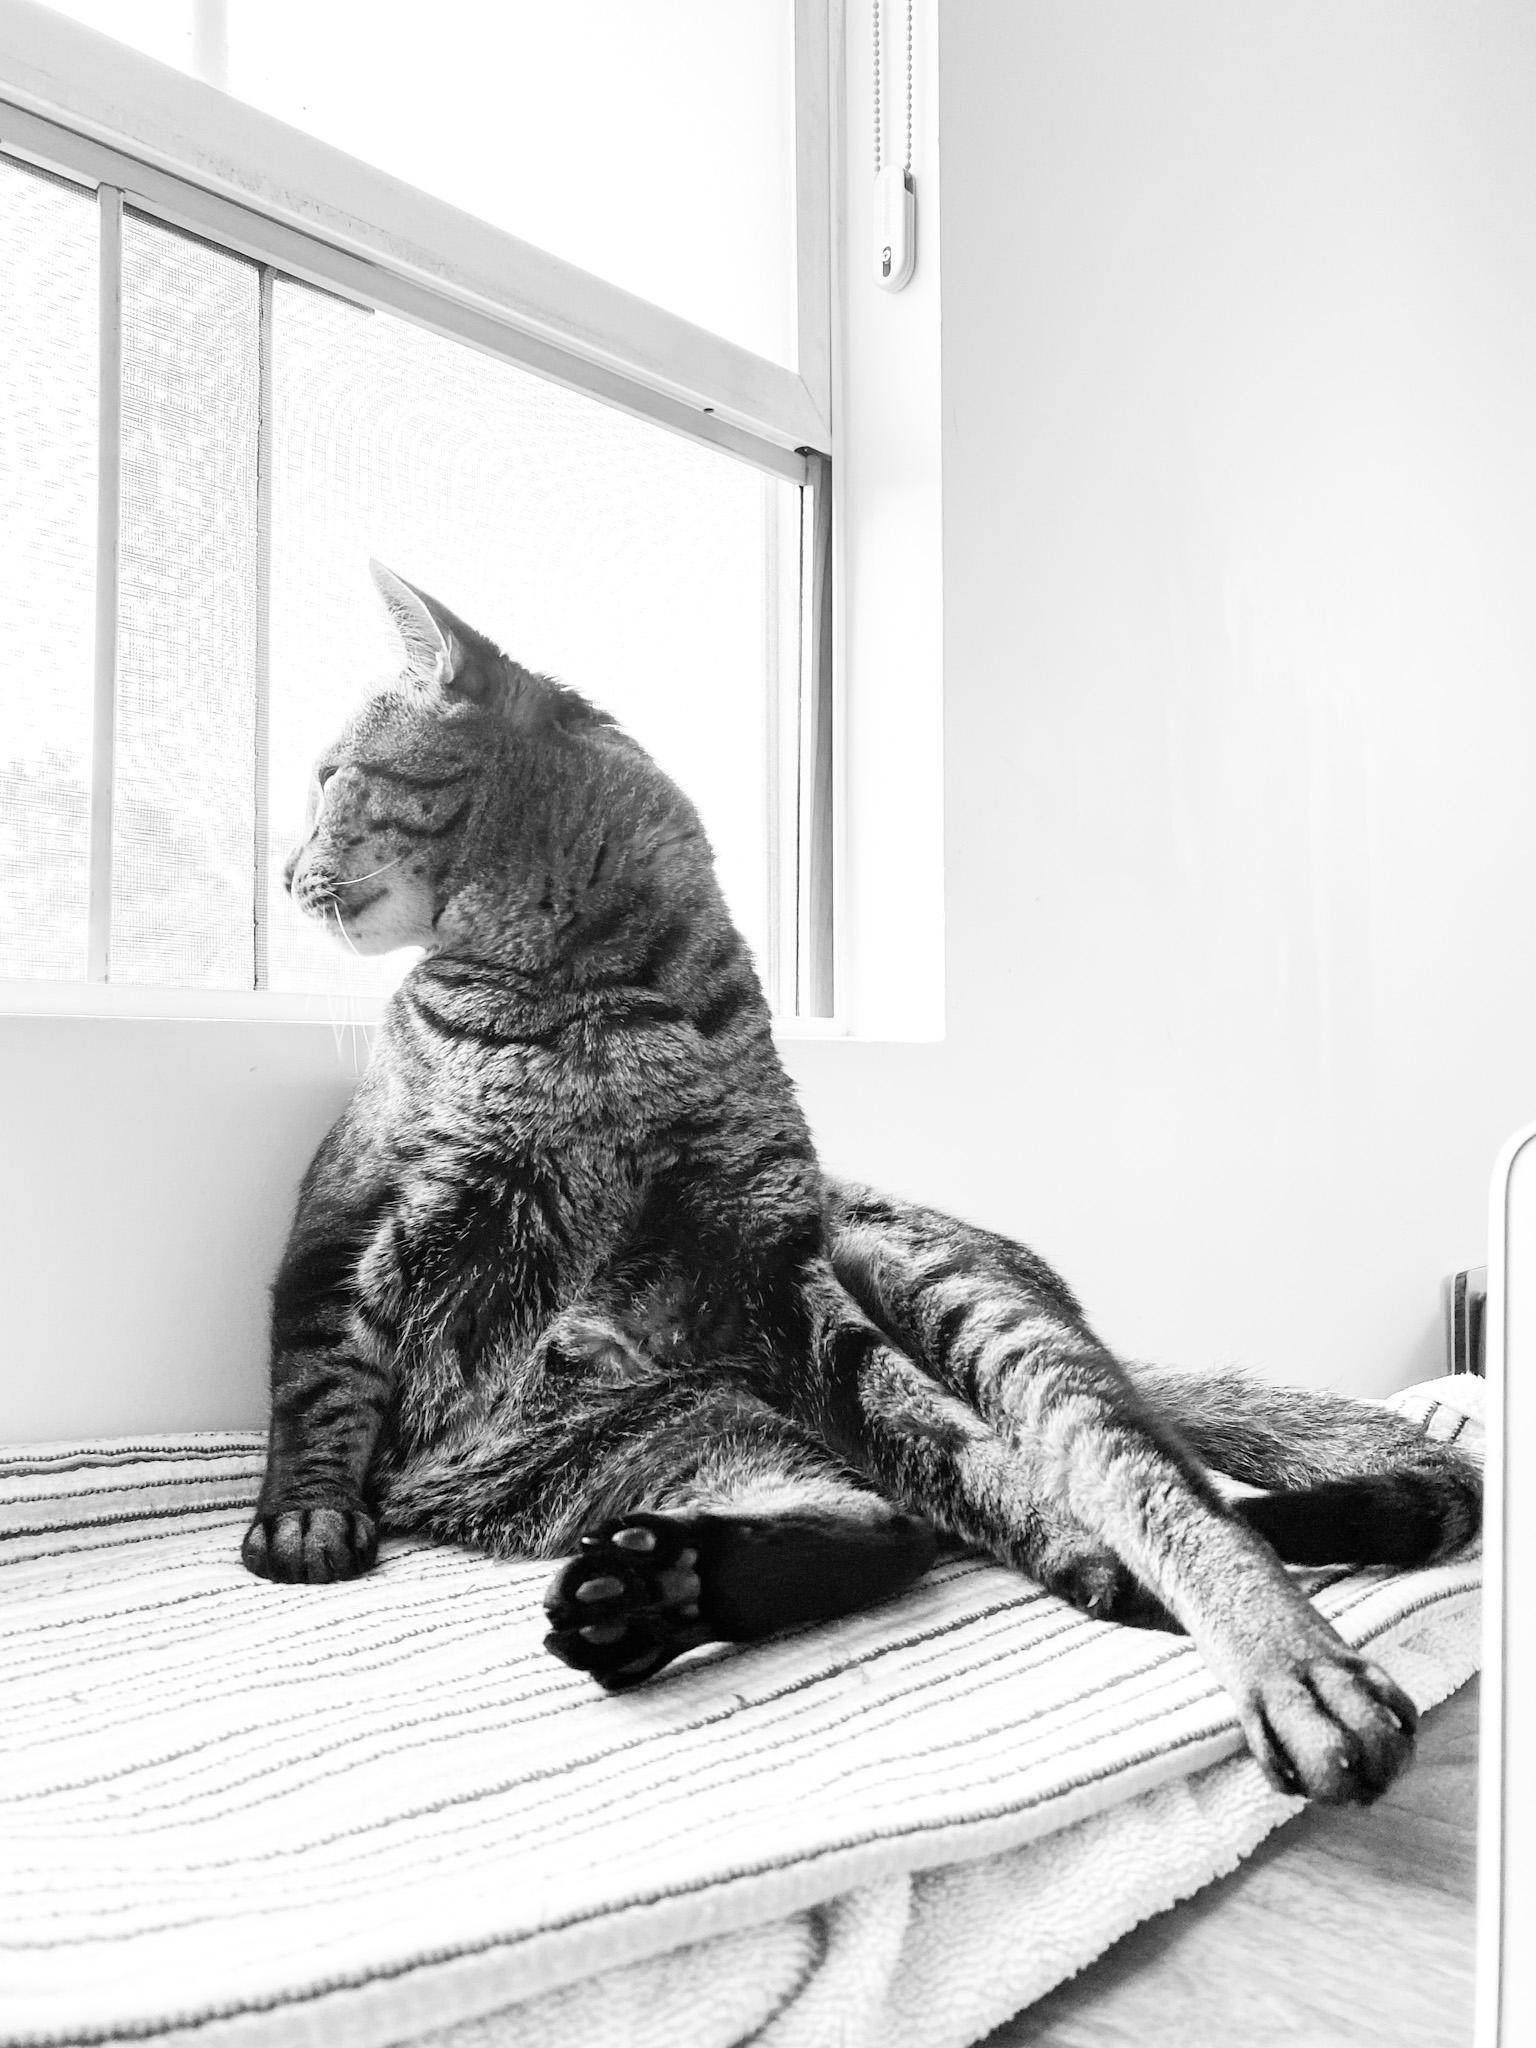 sochi the cat lounging